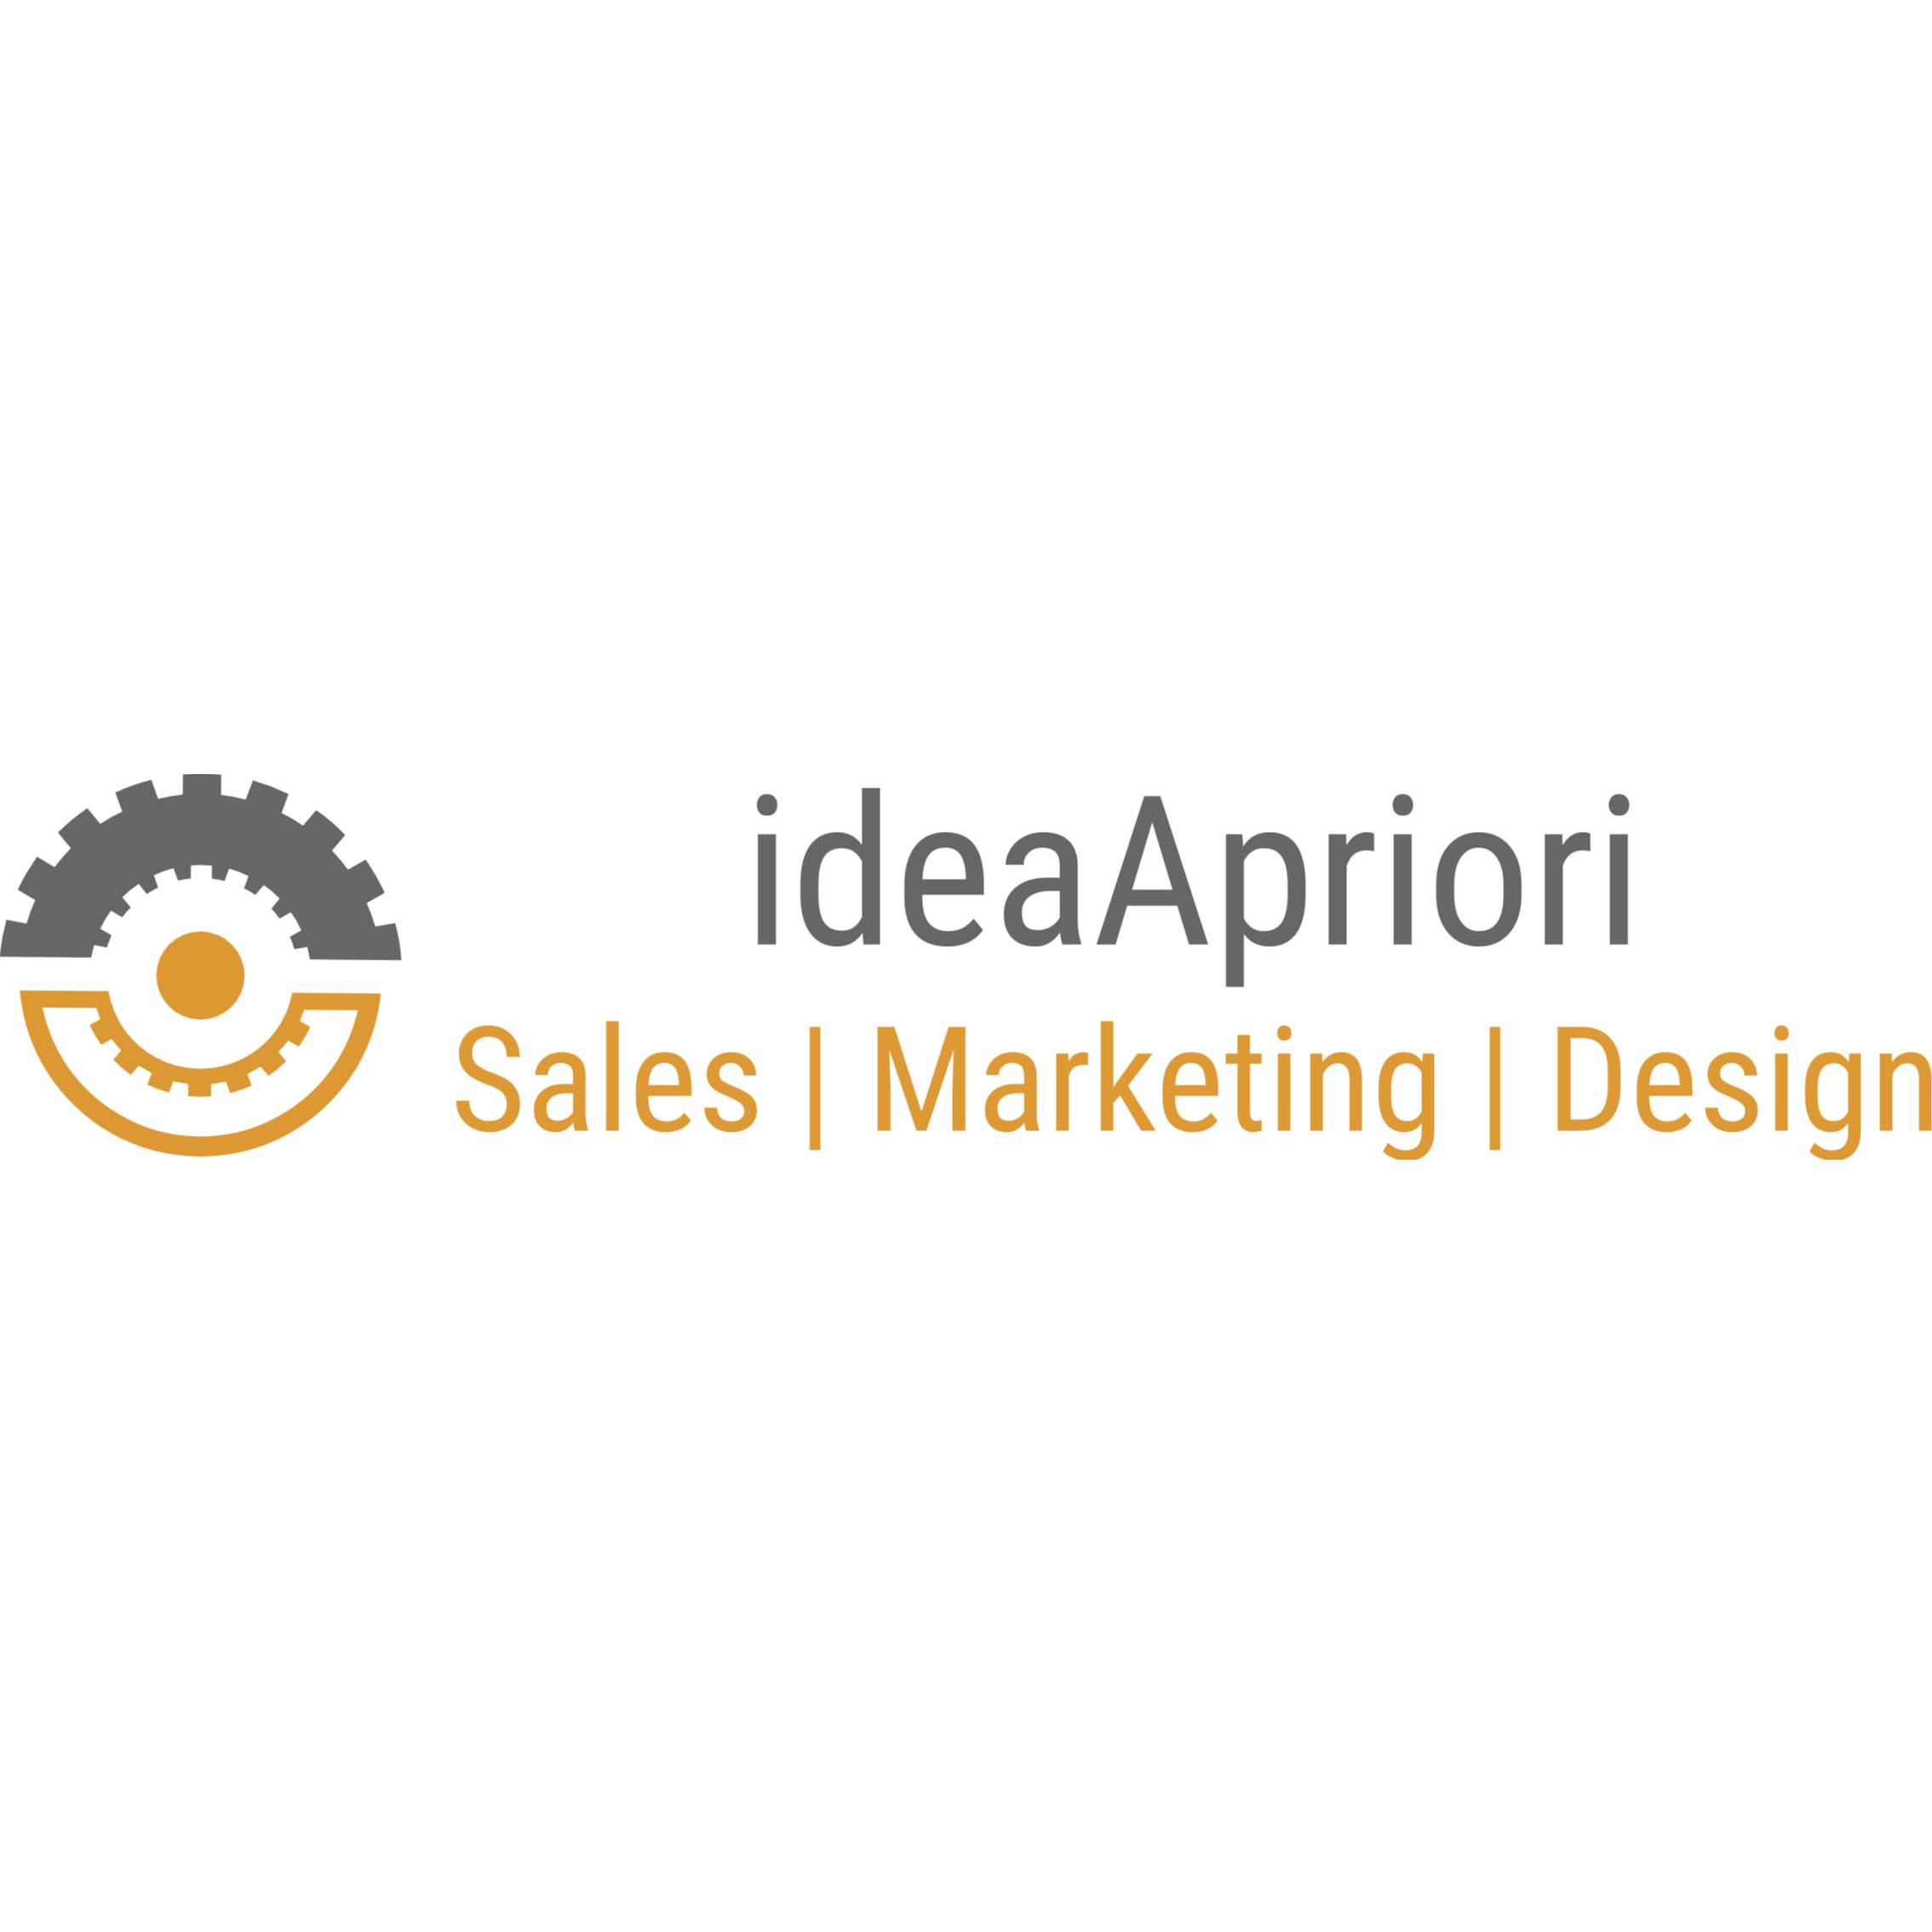 ideaApriori UG Logo